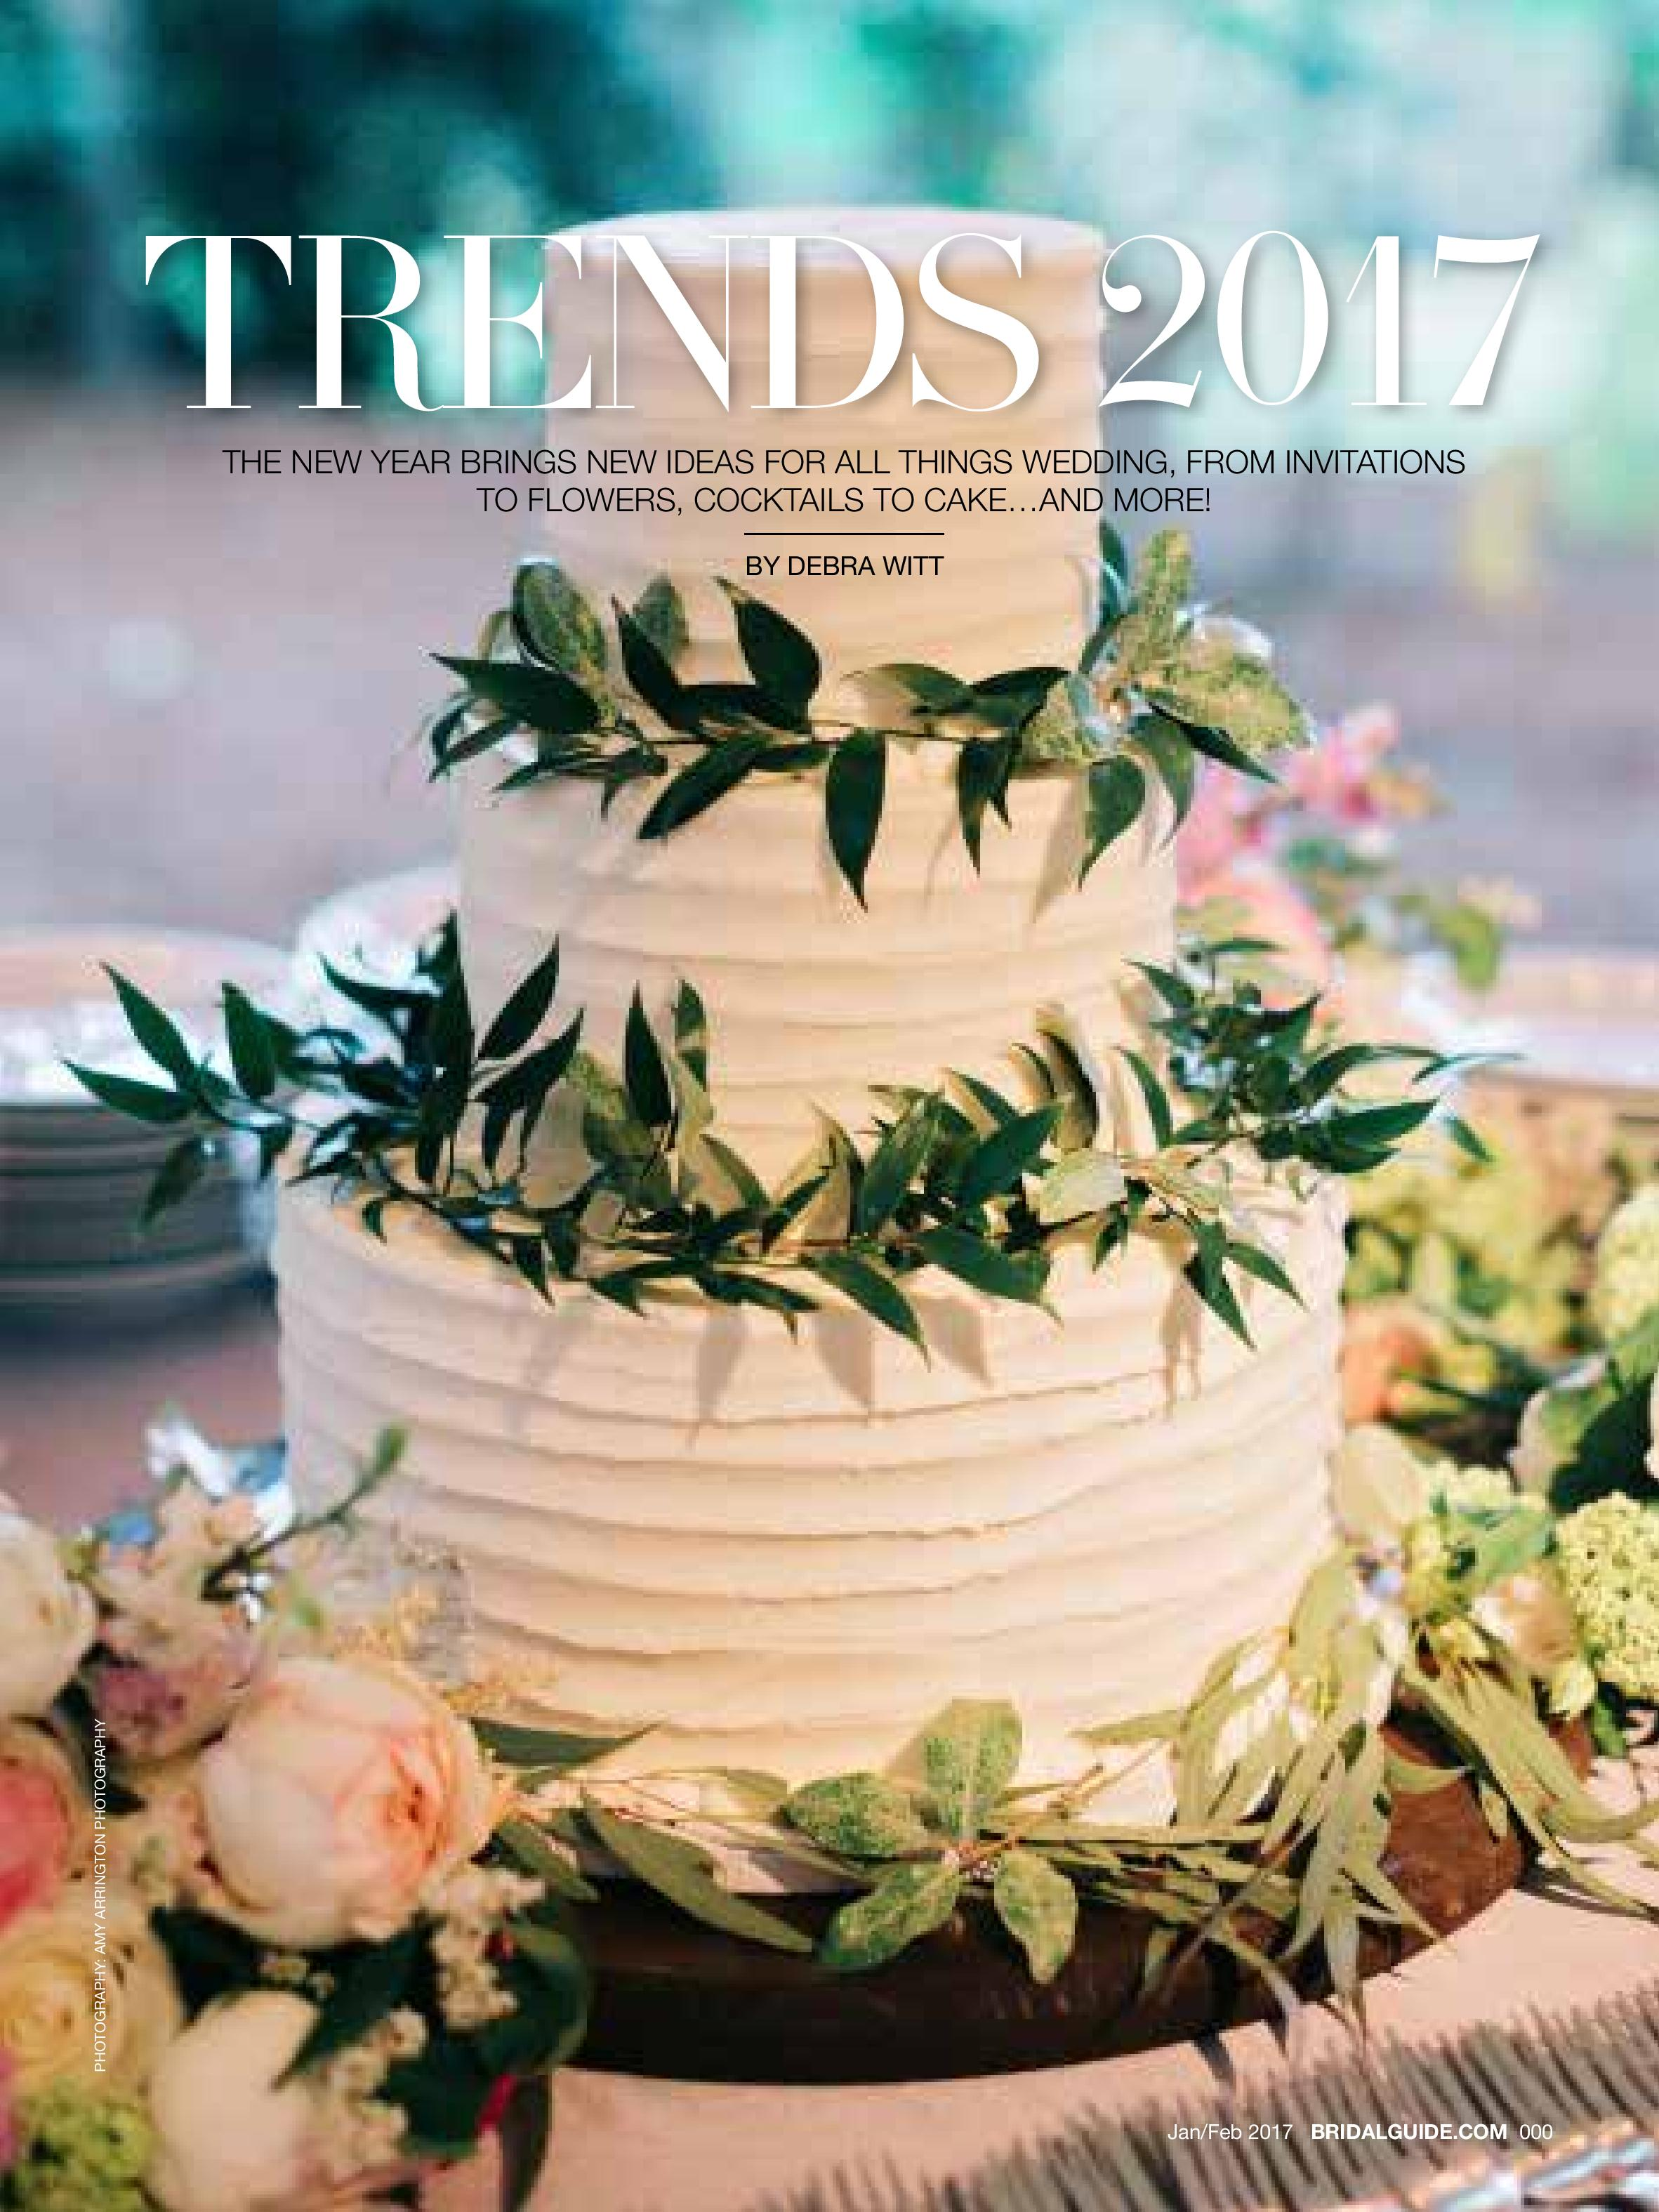 2017 Wedding Trends | Bridal Guide Magazine | Michelle Leo Events | Utah Event Planner and Designer